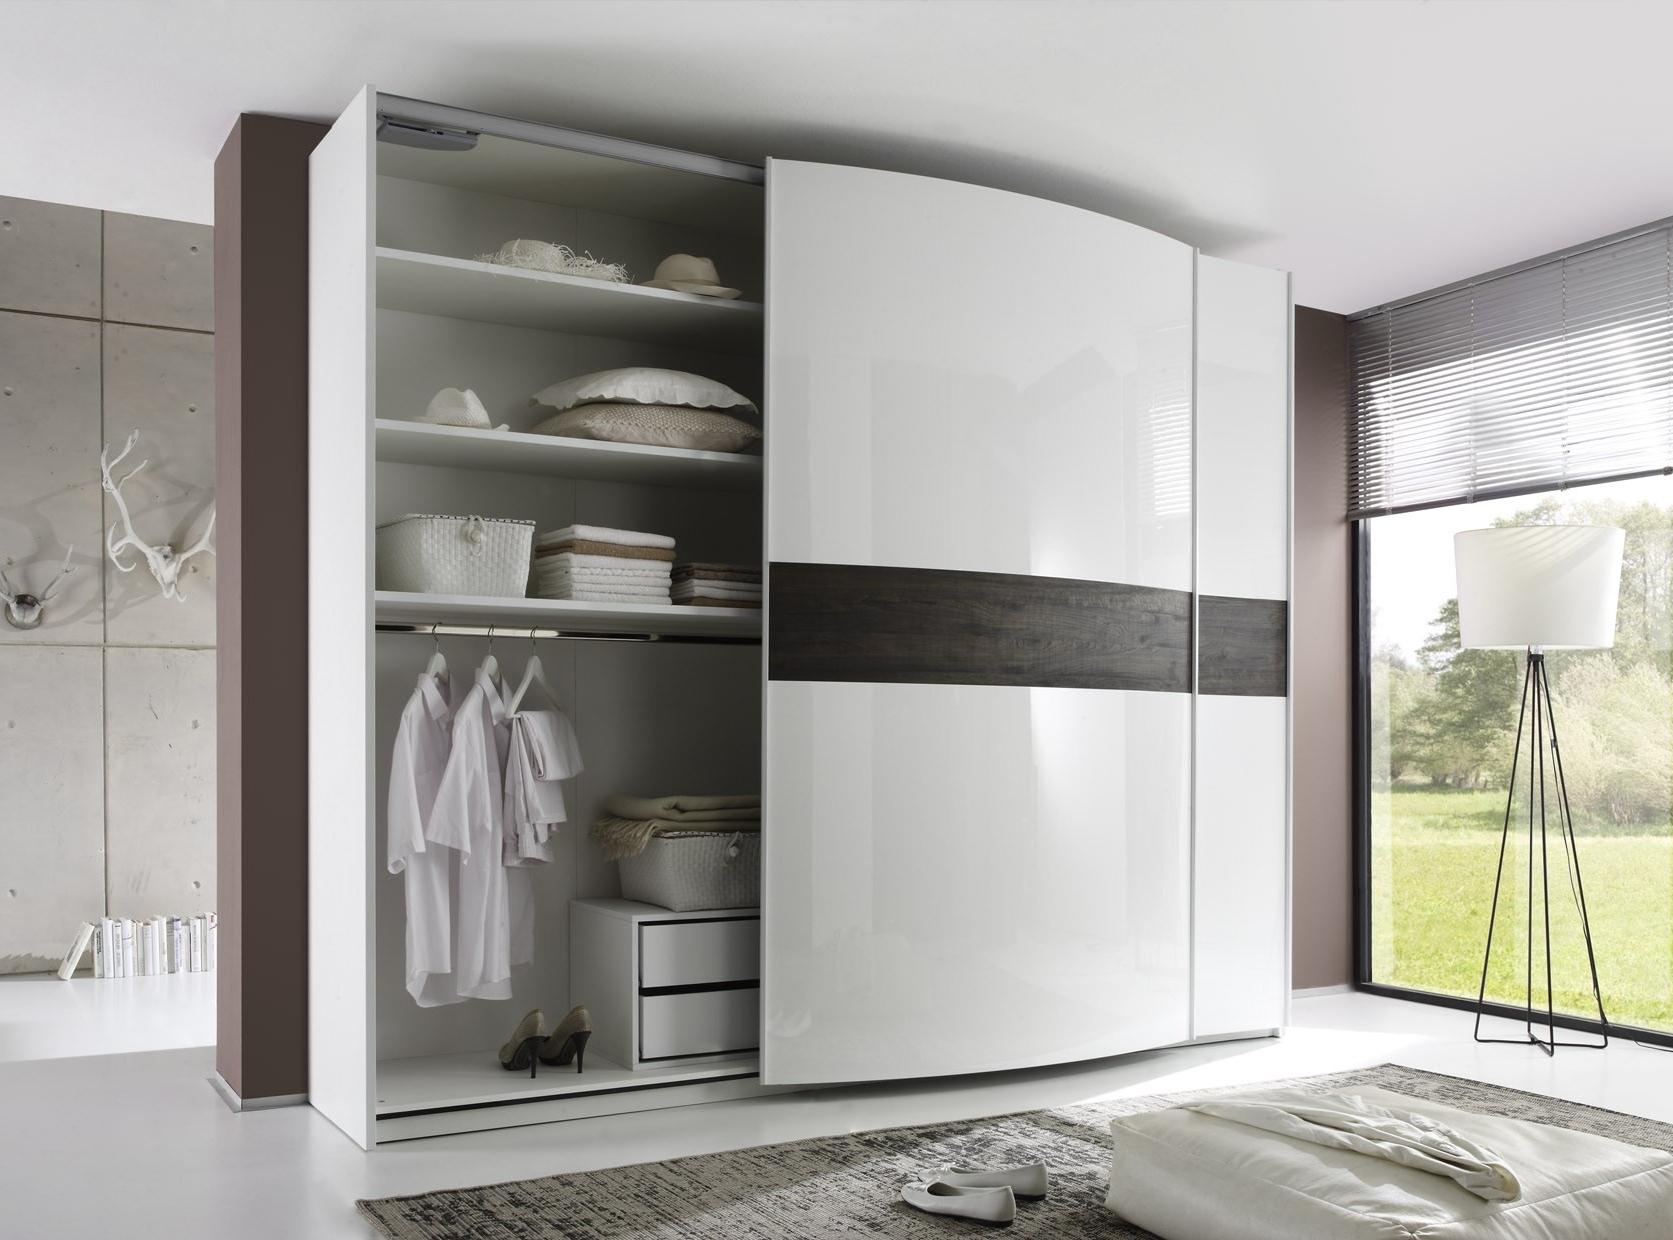 Tambura Curved Sliding Doors Wardrobe, White + Wenge Buy Online At Regarding Fashionable High Gloss Doors Wardrobes (View 14 of 15)